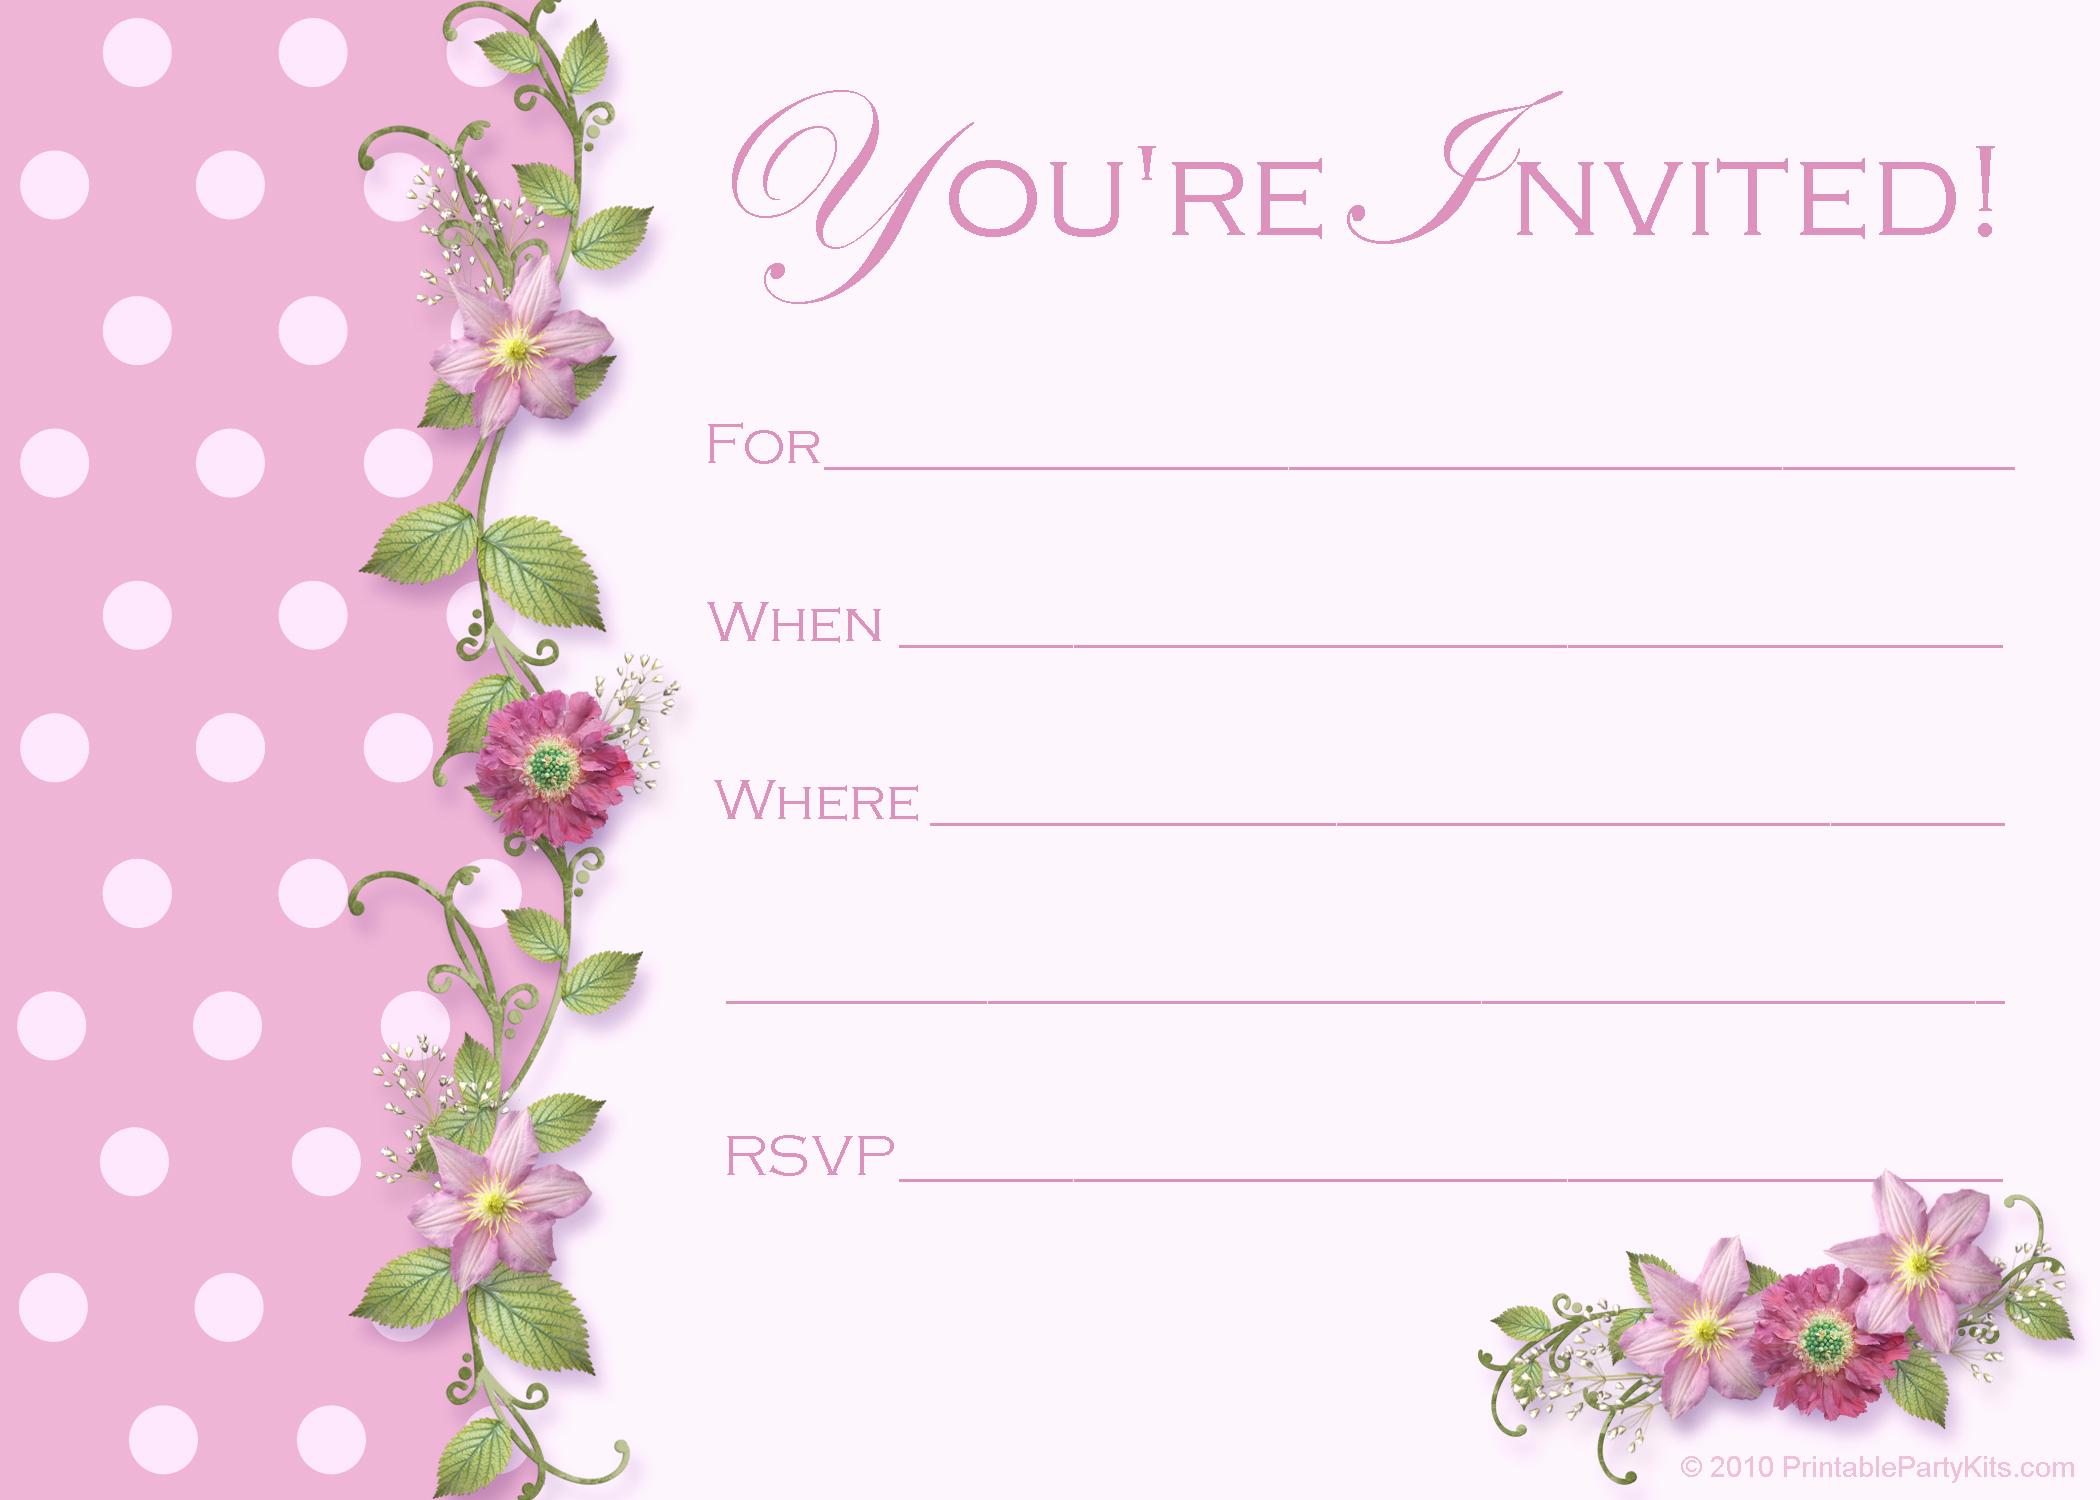 Free Printable Birthday Invitation Templates New Free Sweet 16 Birthday Invitations – Free Printable